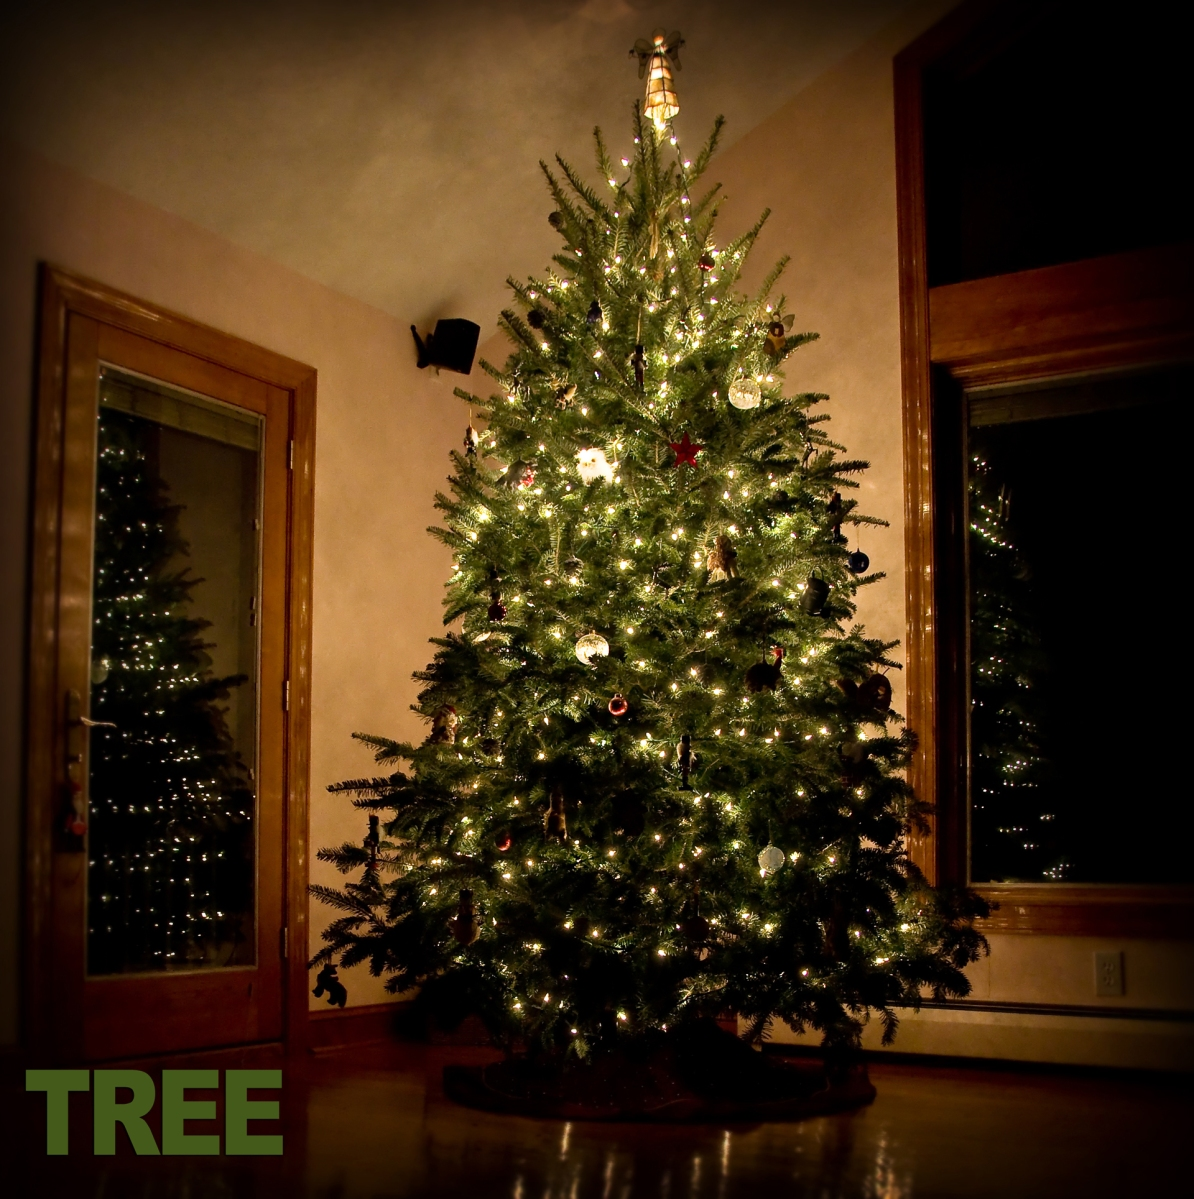 8 - Tree